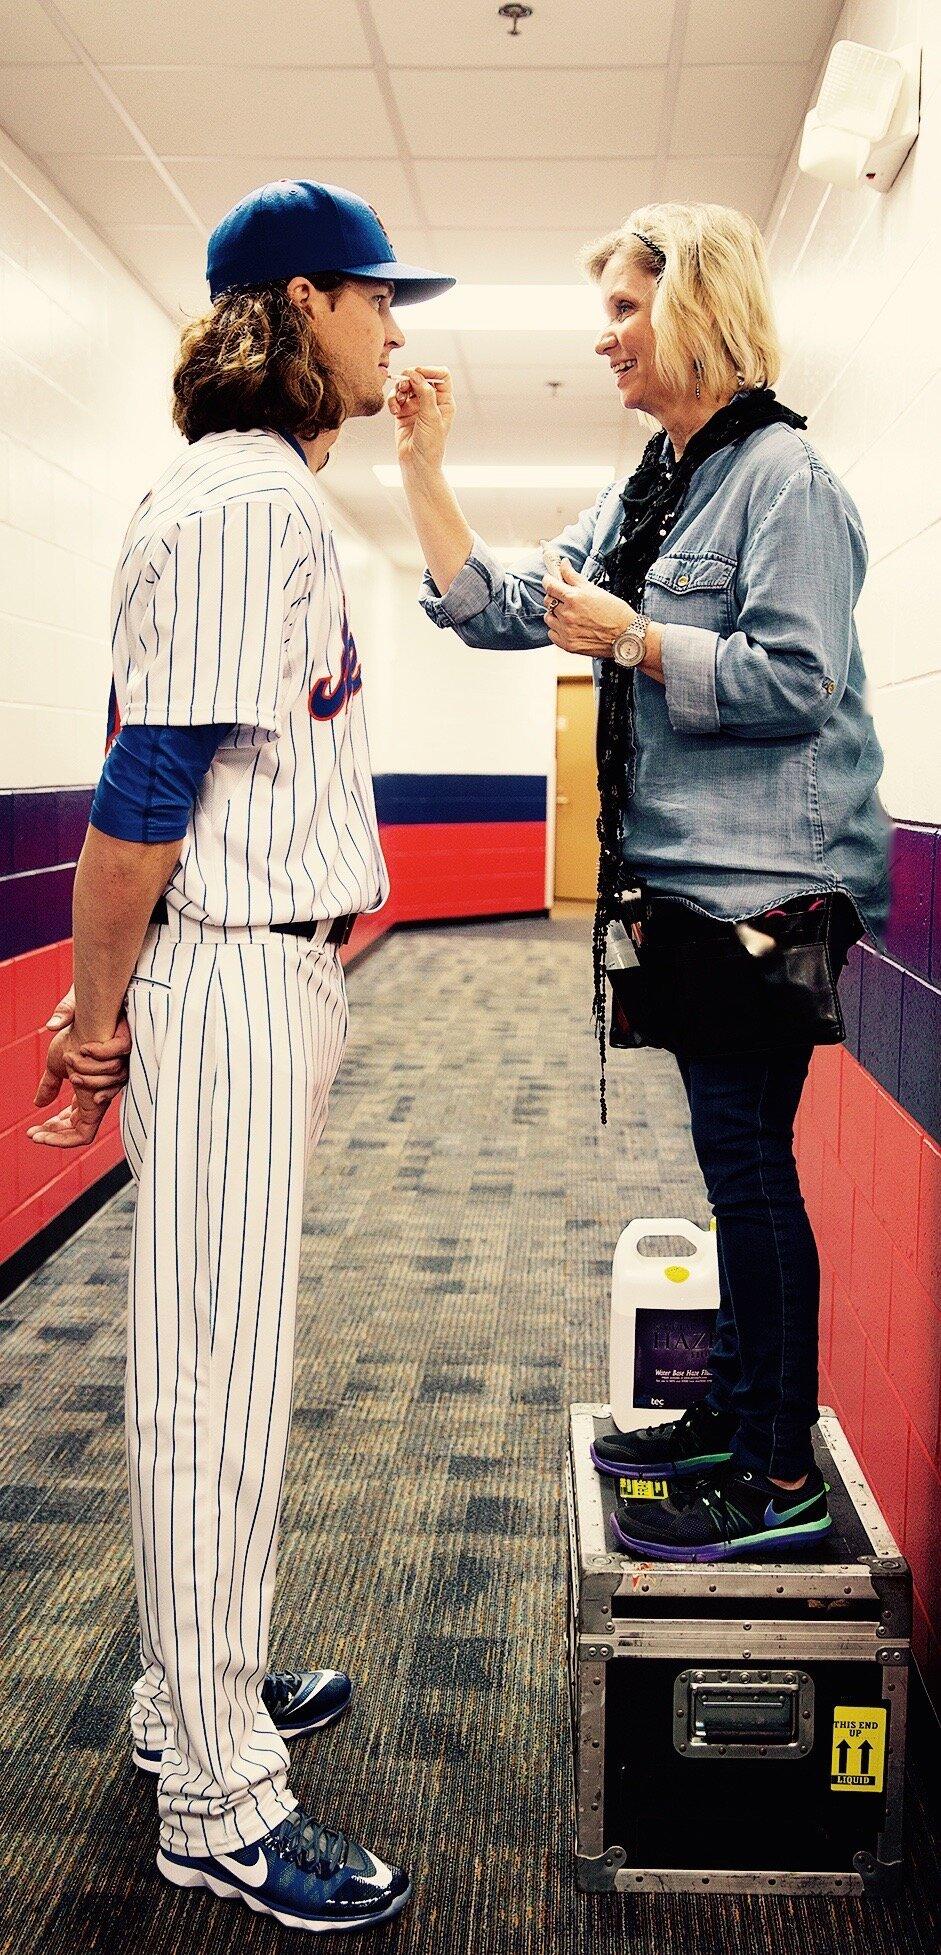 JOELSON_MLB16_2381_WEB.jpg